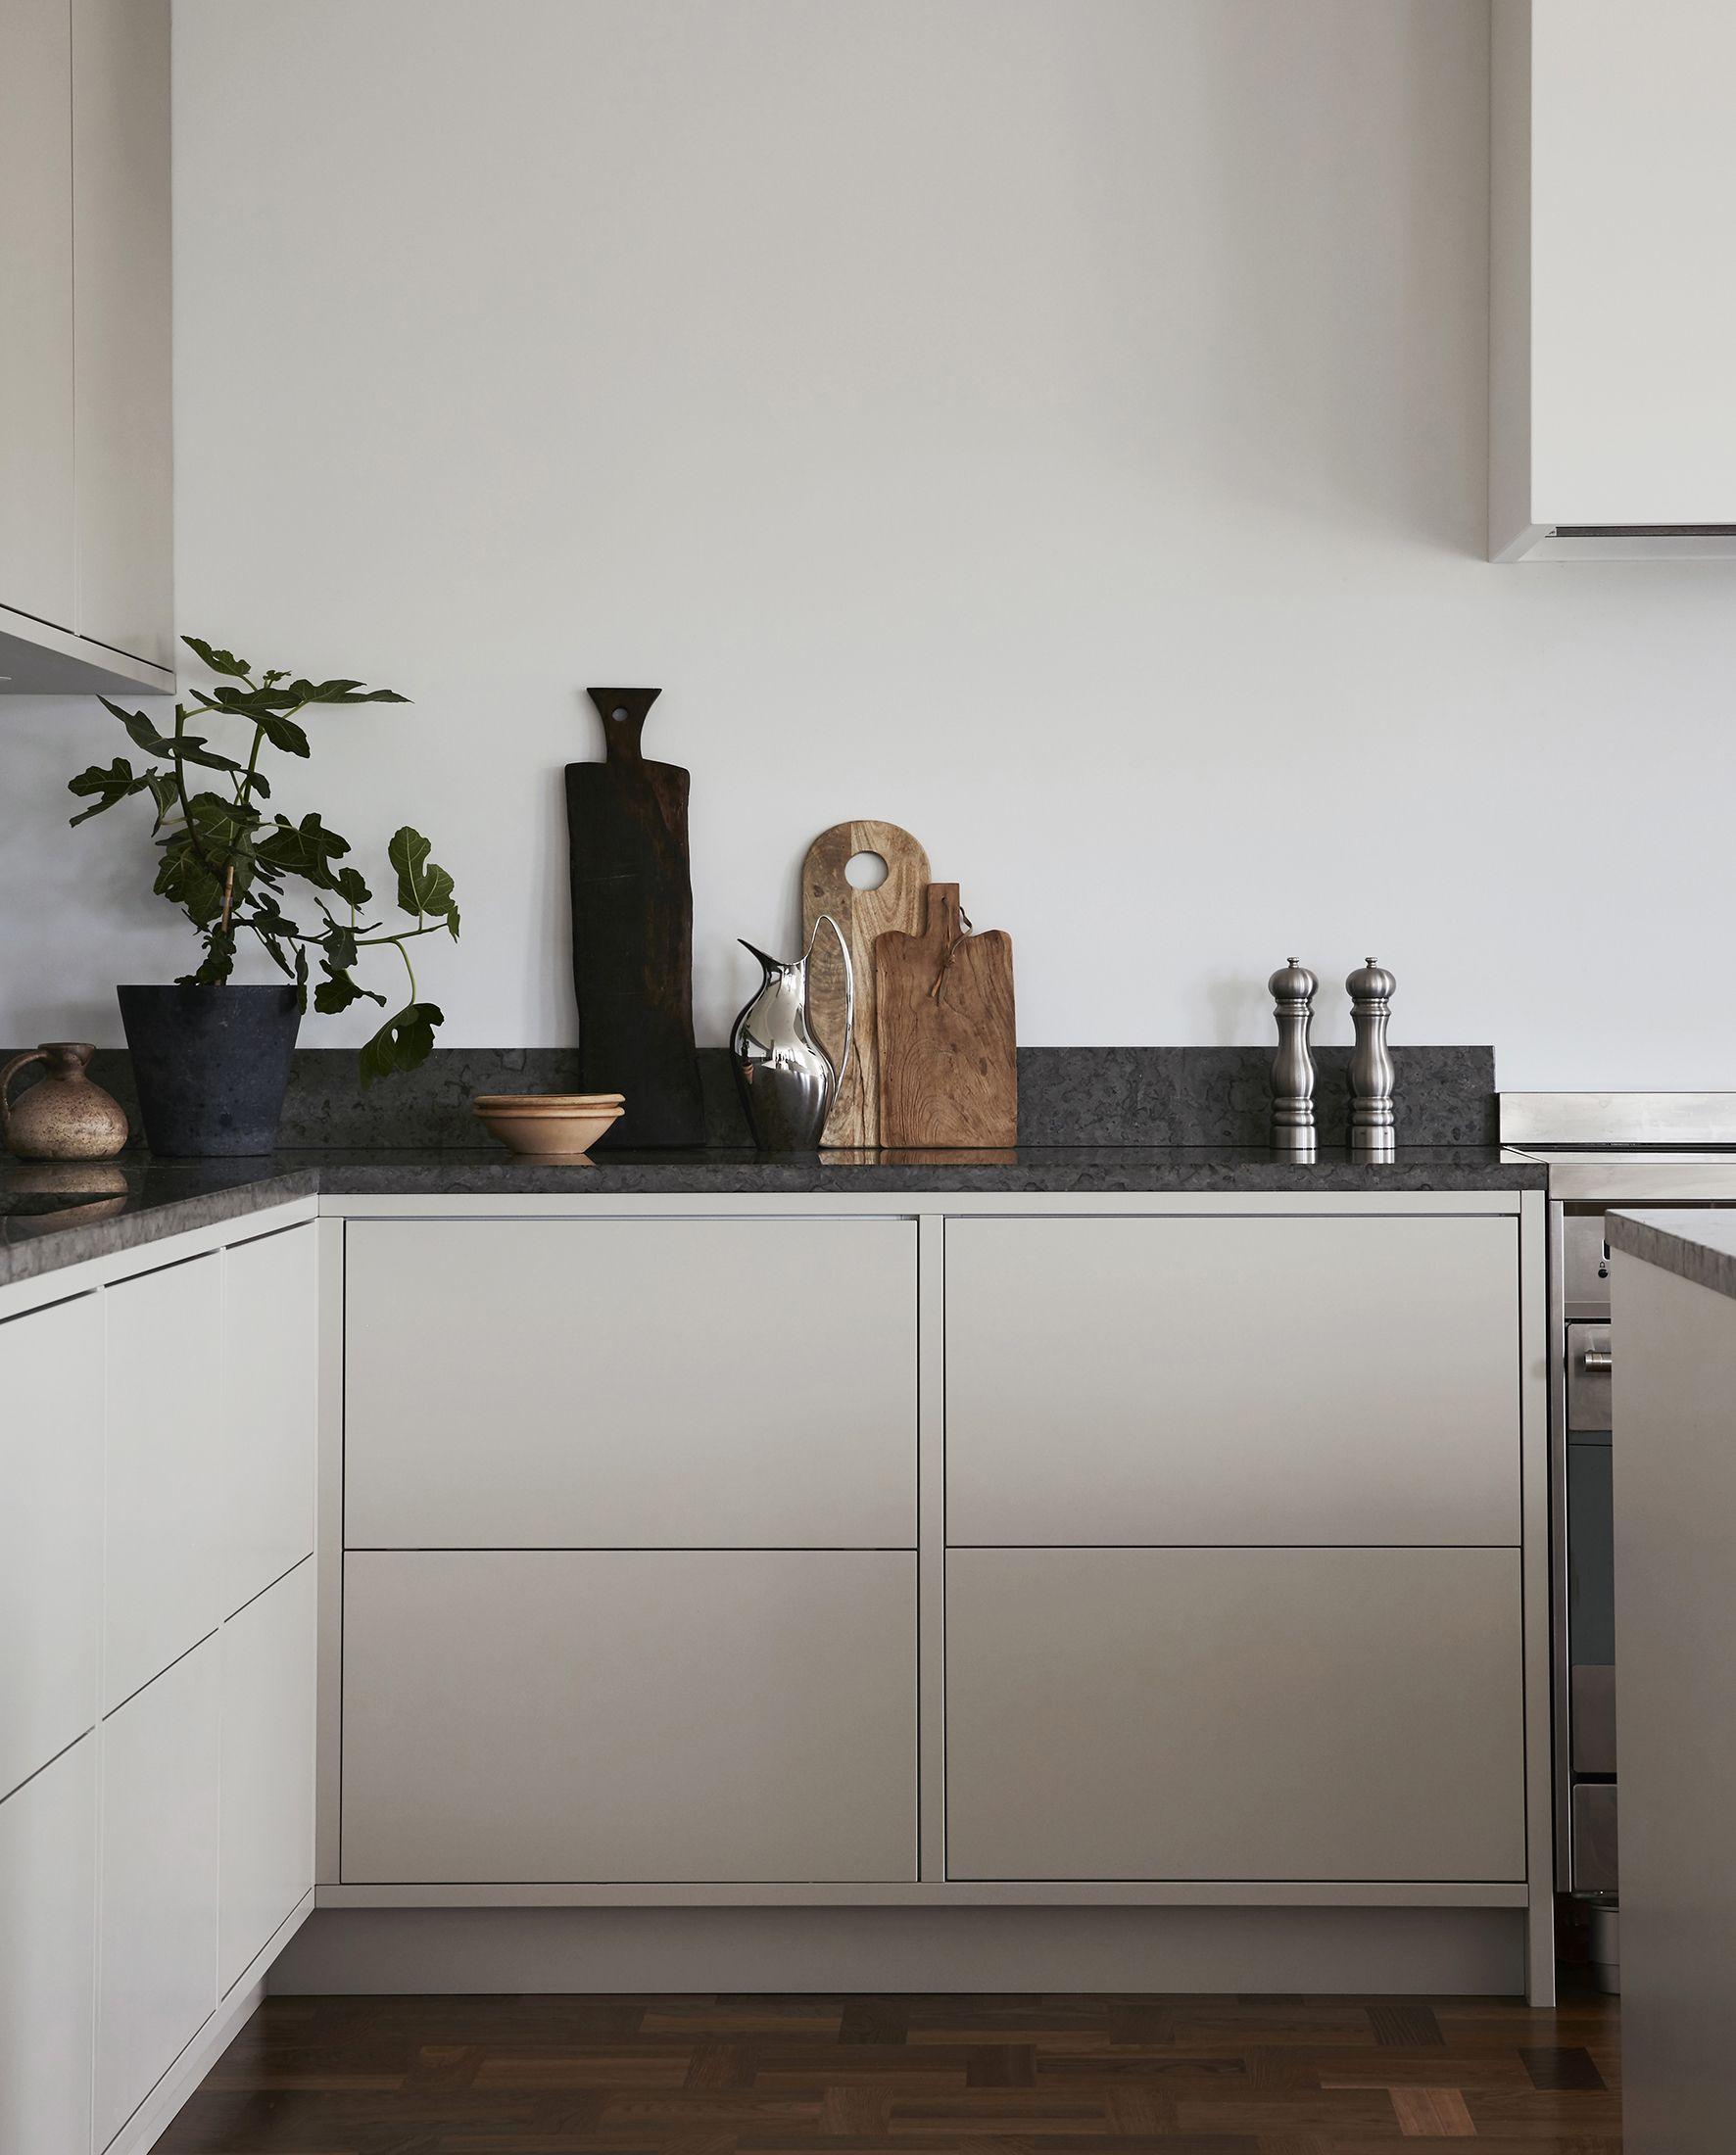 nordiska k k nordic minimalist kitchen with open kitchen island rh pinterest com